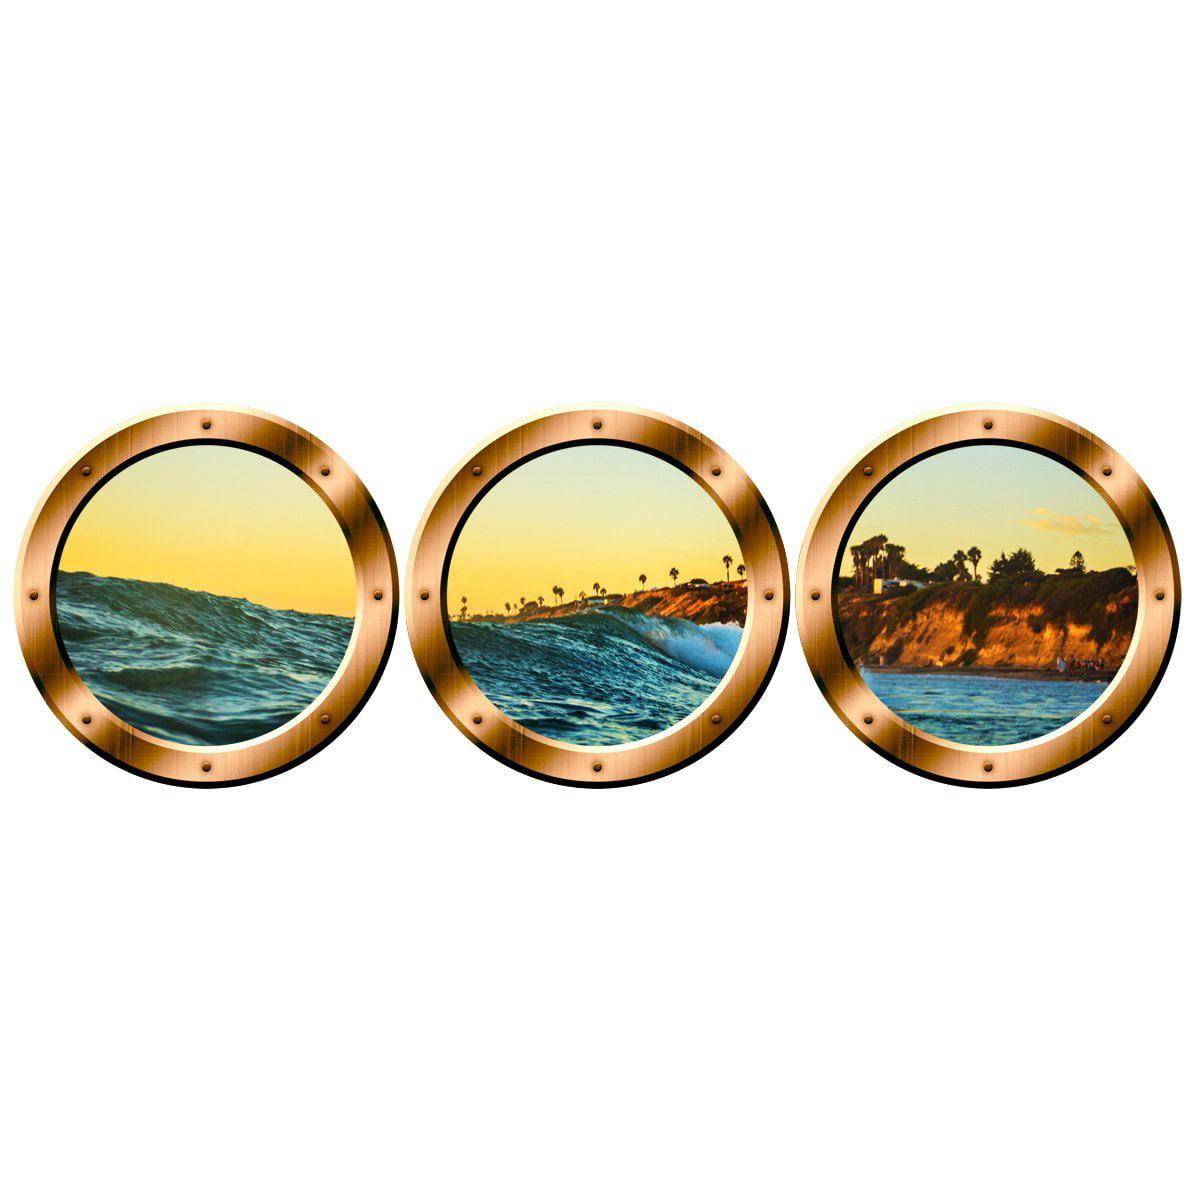 "VWAQ Wall Art Decor - Submarine Porthole Decal, Nature Scenery Prints - VWAQ-SPW12 (14"" Diameter, Gold)"